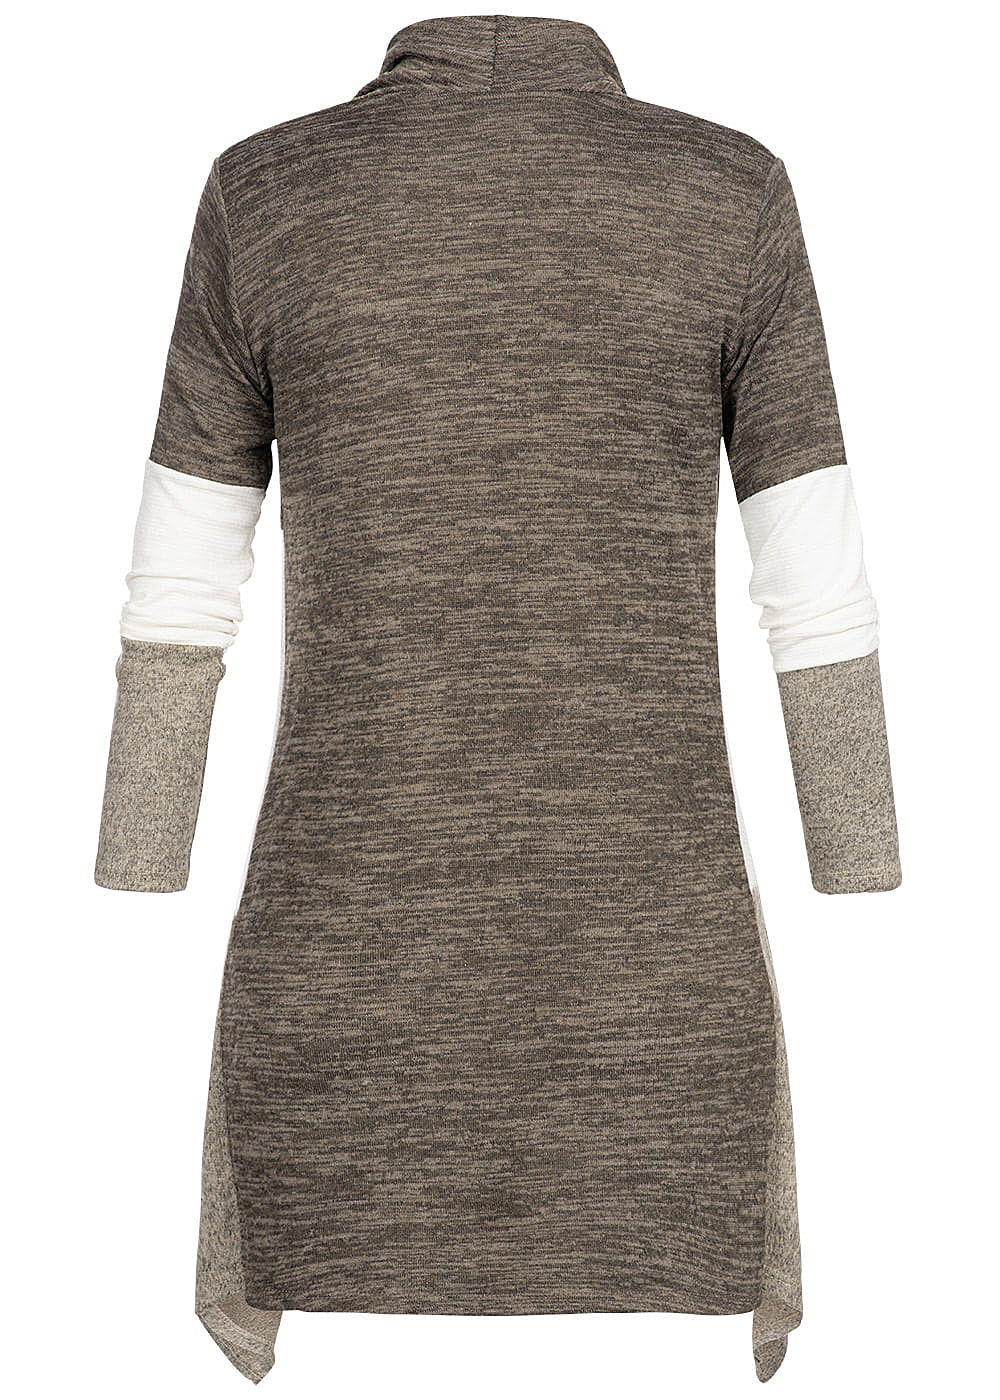 043a7d092445 Styleboom Fashion Damen Cardigan Colorblock fango braun weiss beige ...